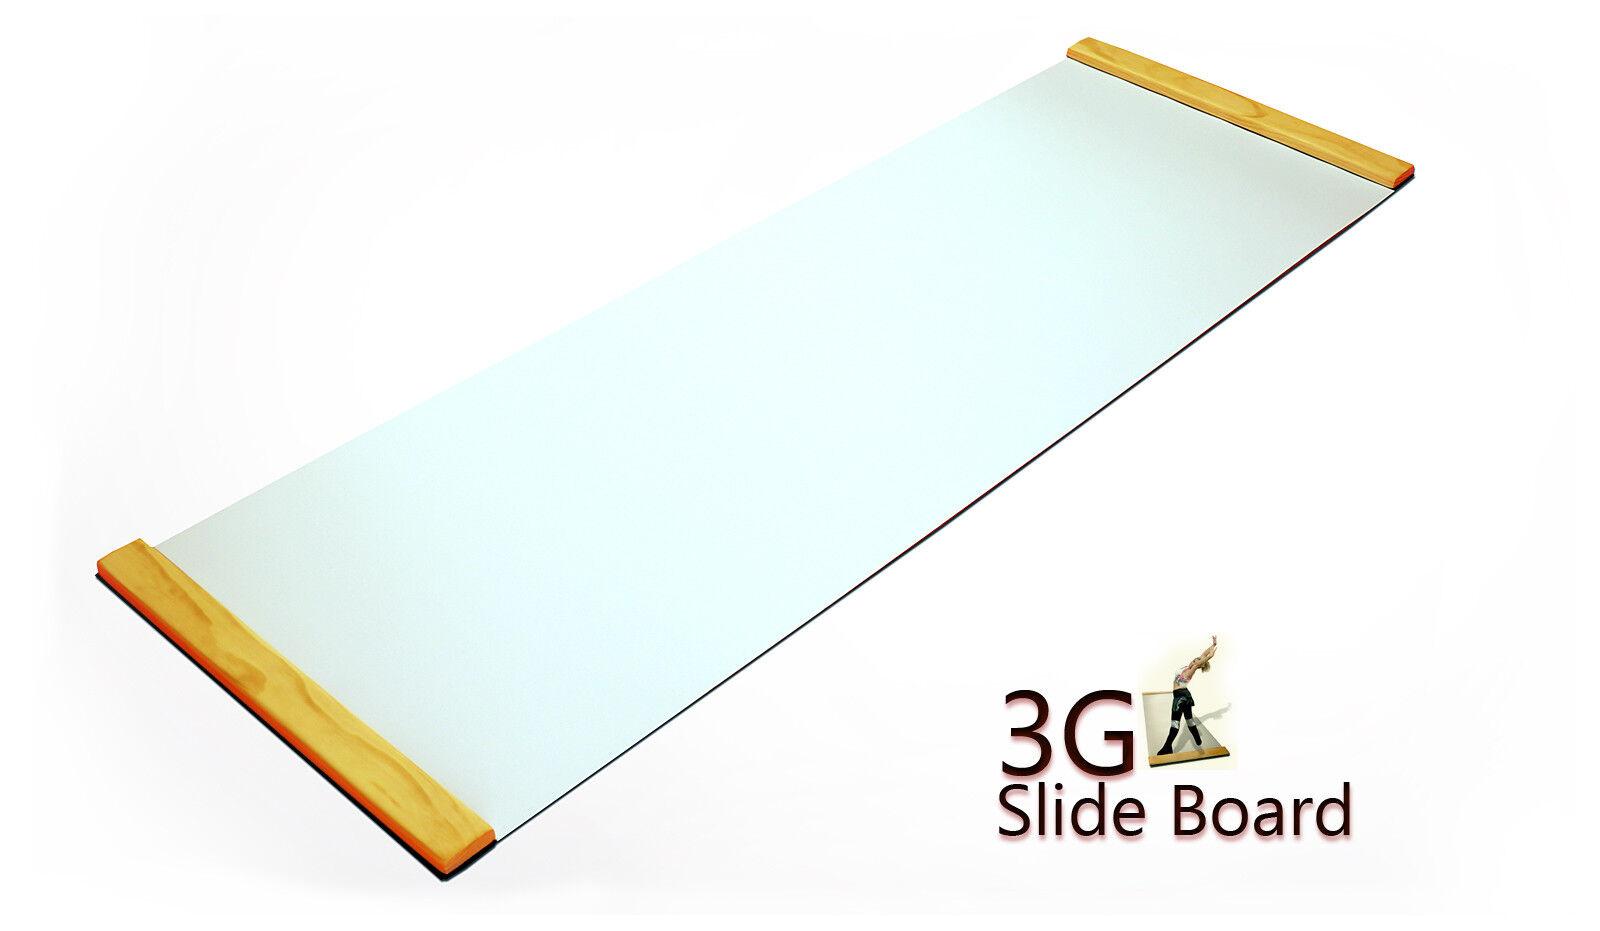 3g Premium Grueso diapositiva Board 6 Pies X 2 Pies Nuevo